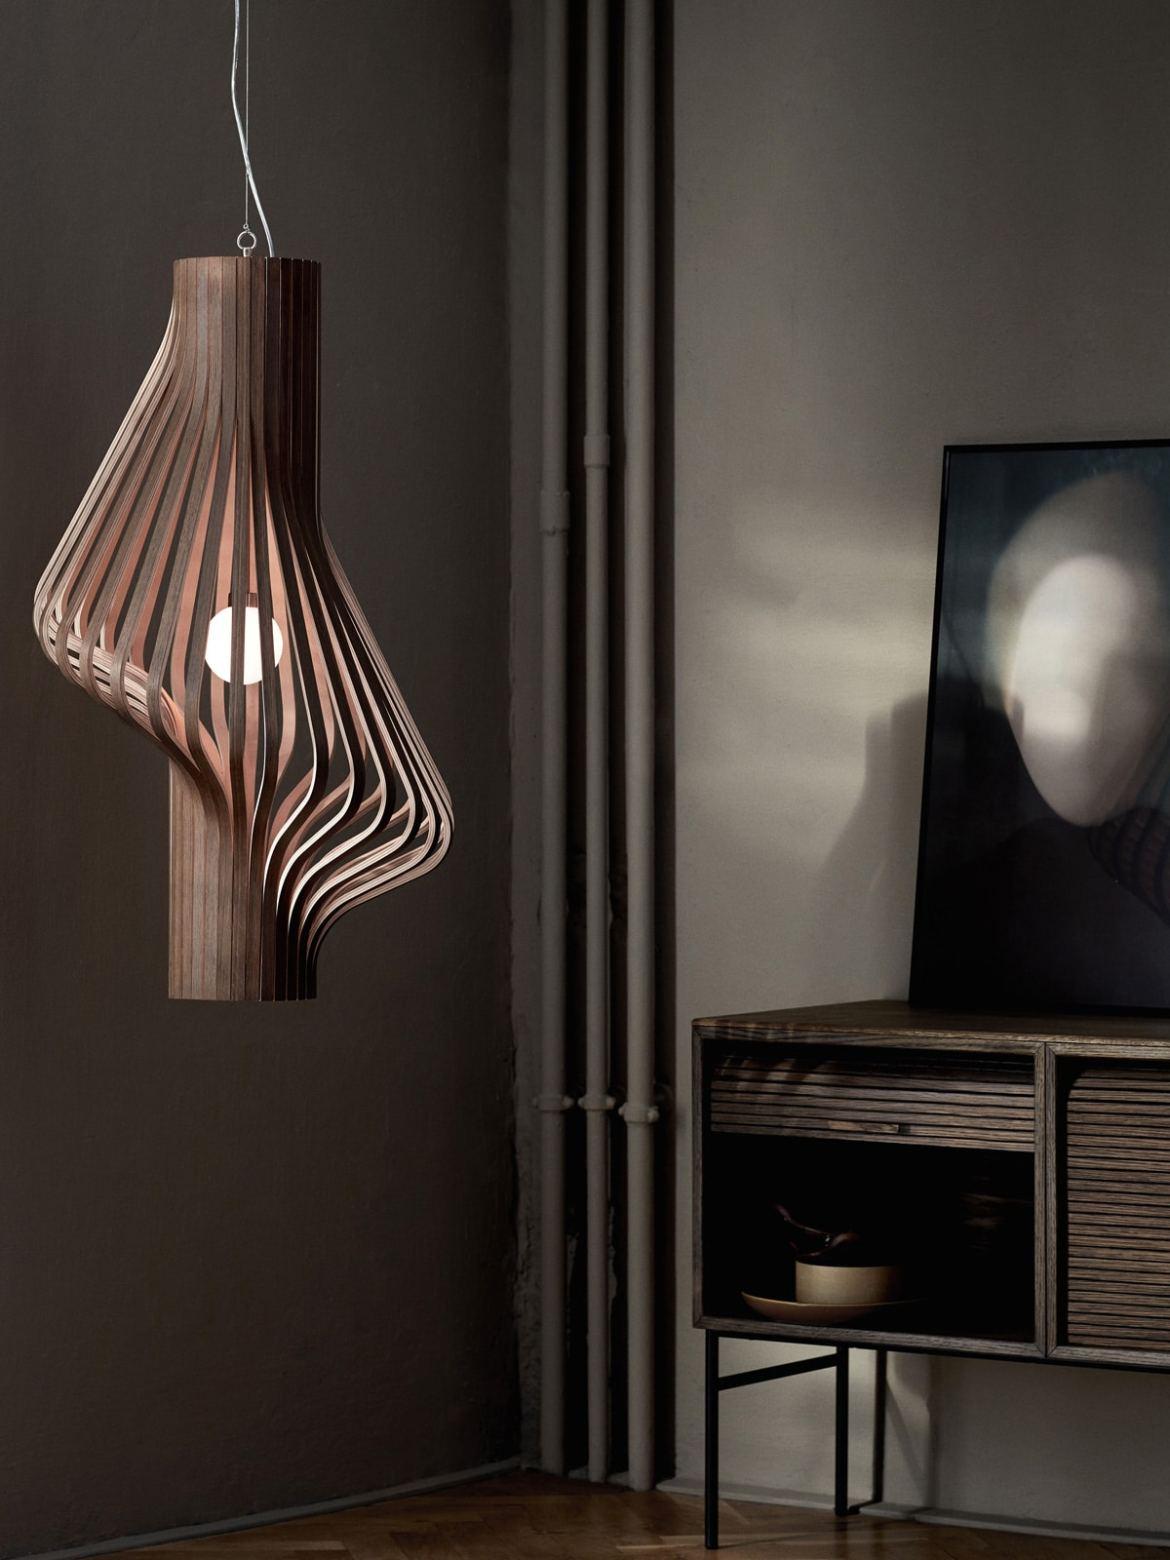 DesignOrt Blog: Holzlampen Diva Northern Lighting